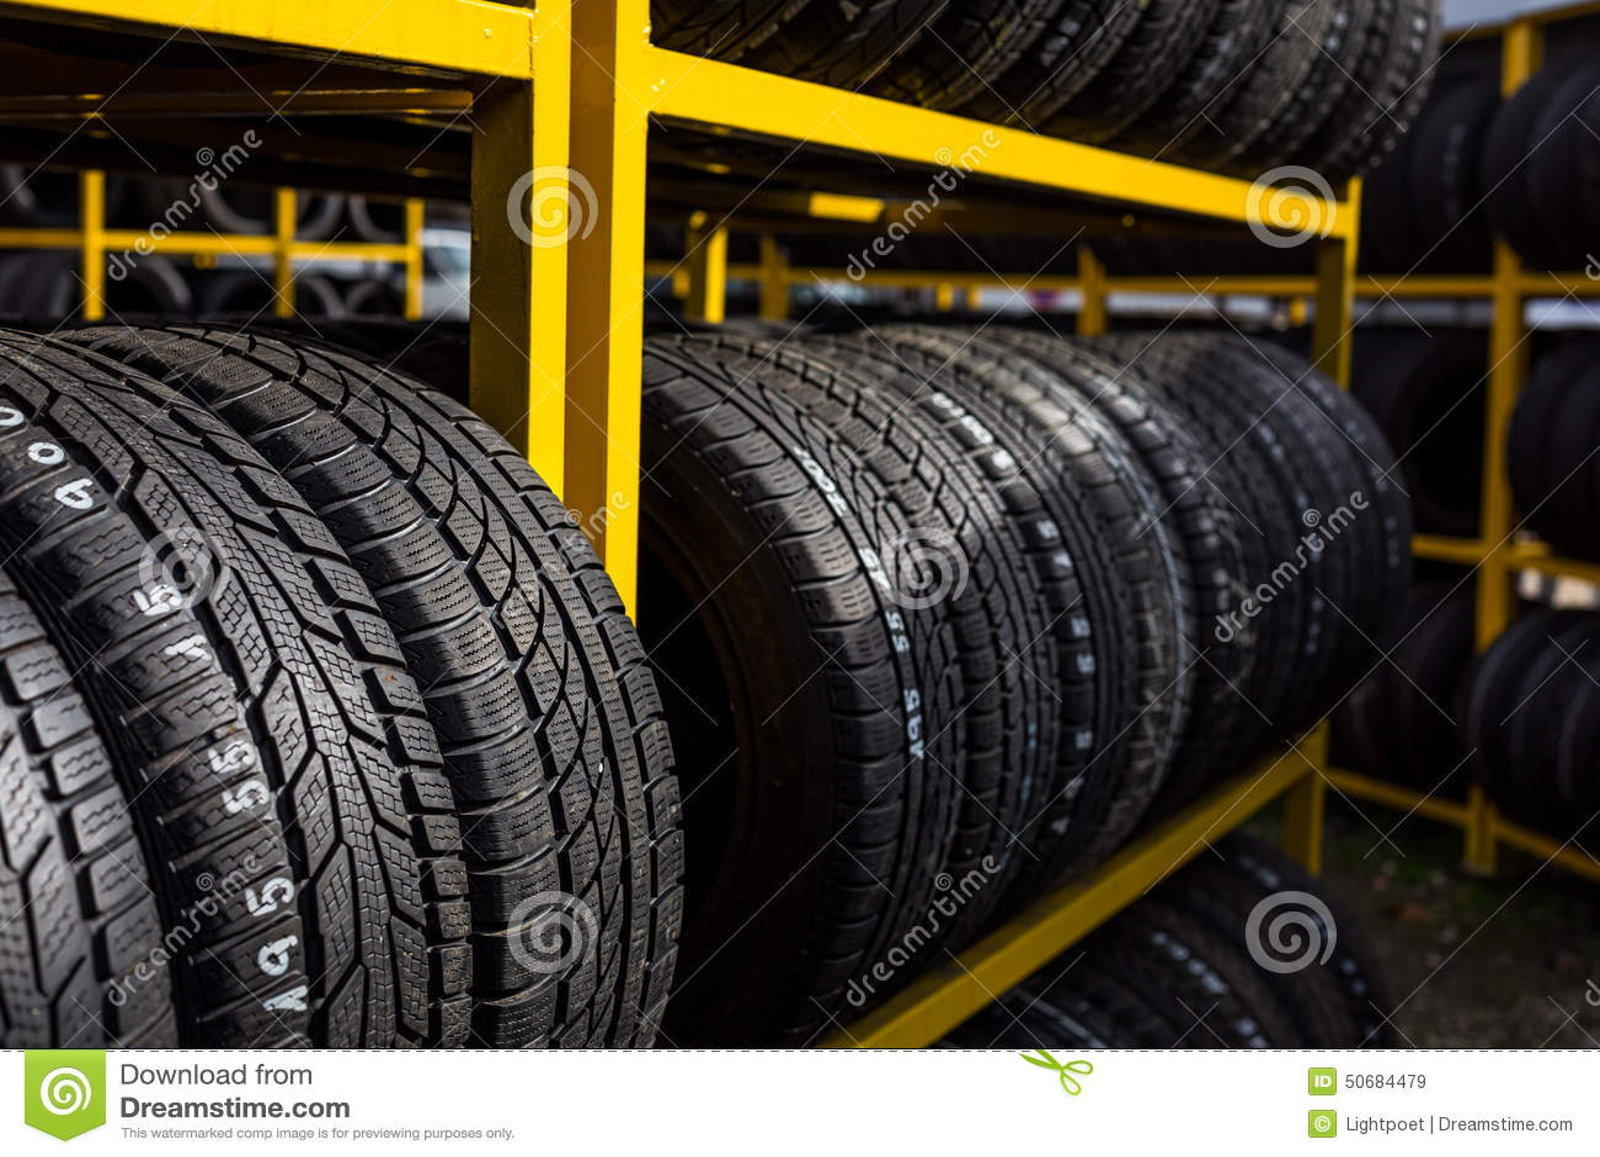 Download 轮胎待售 库存图片. 图片 包括有 行业, automatics, 宽频, 辐形, 外缘, 插孔, 自动 - 50684479